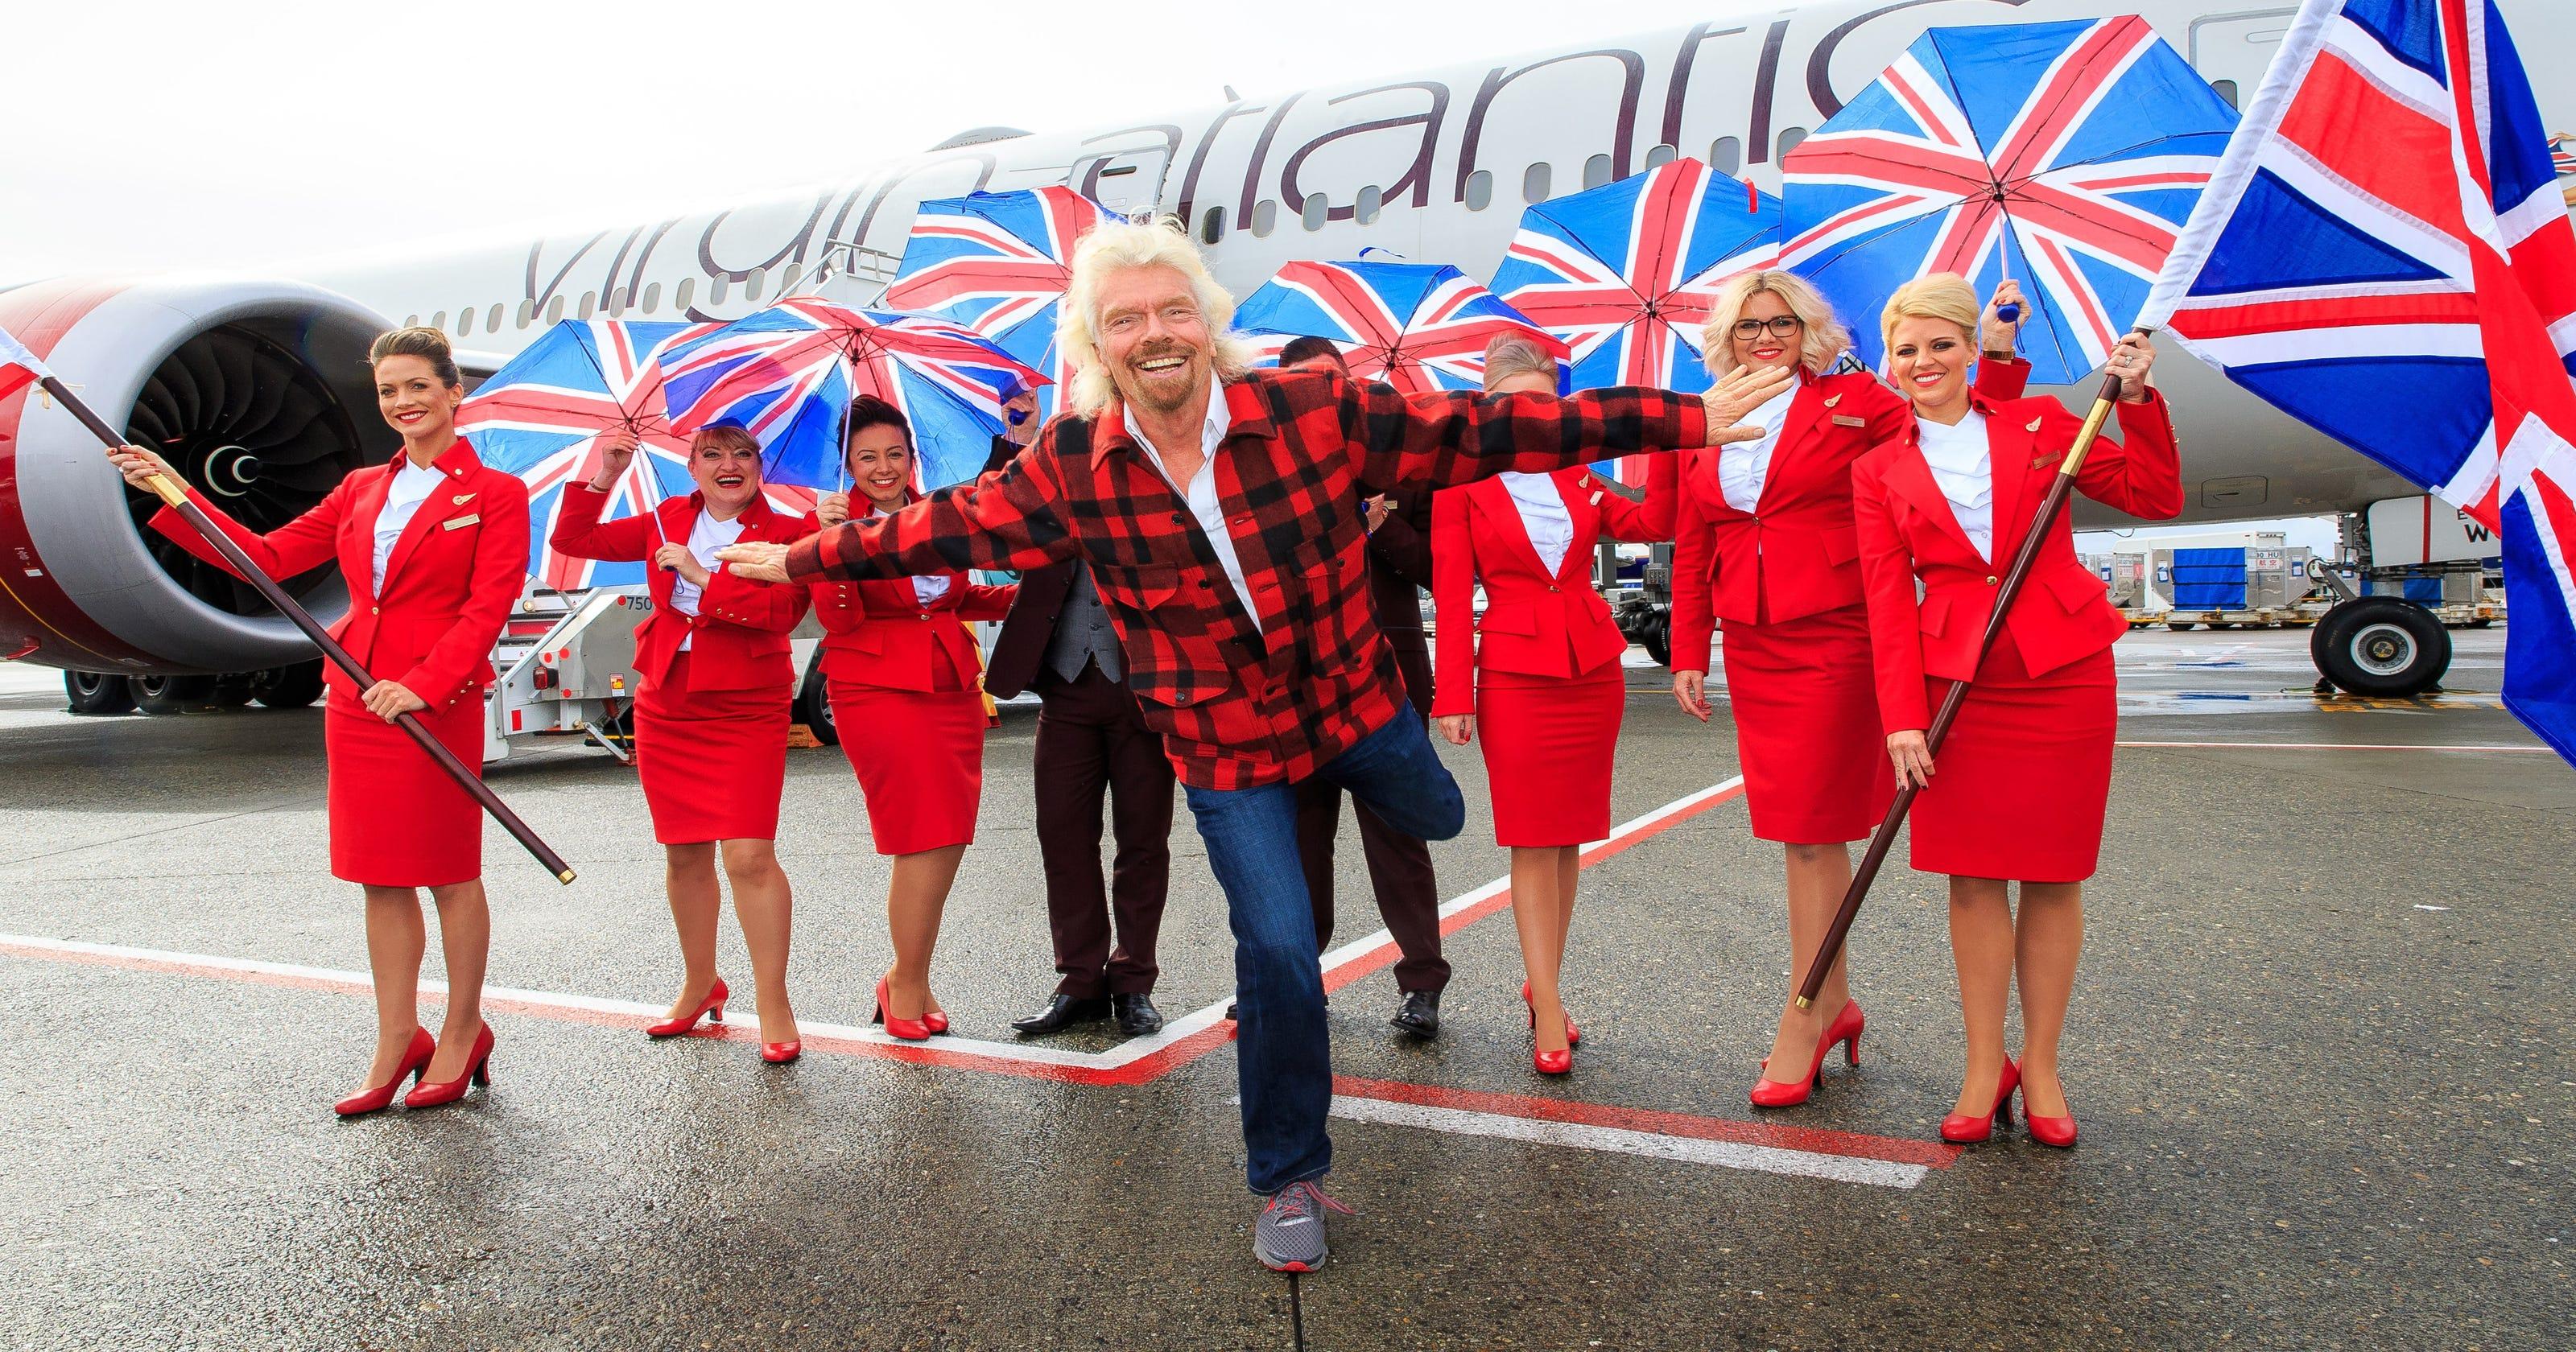 Virgin Atlantic overhauls economy fares, adds no-frills option